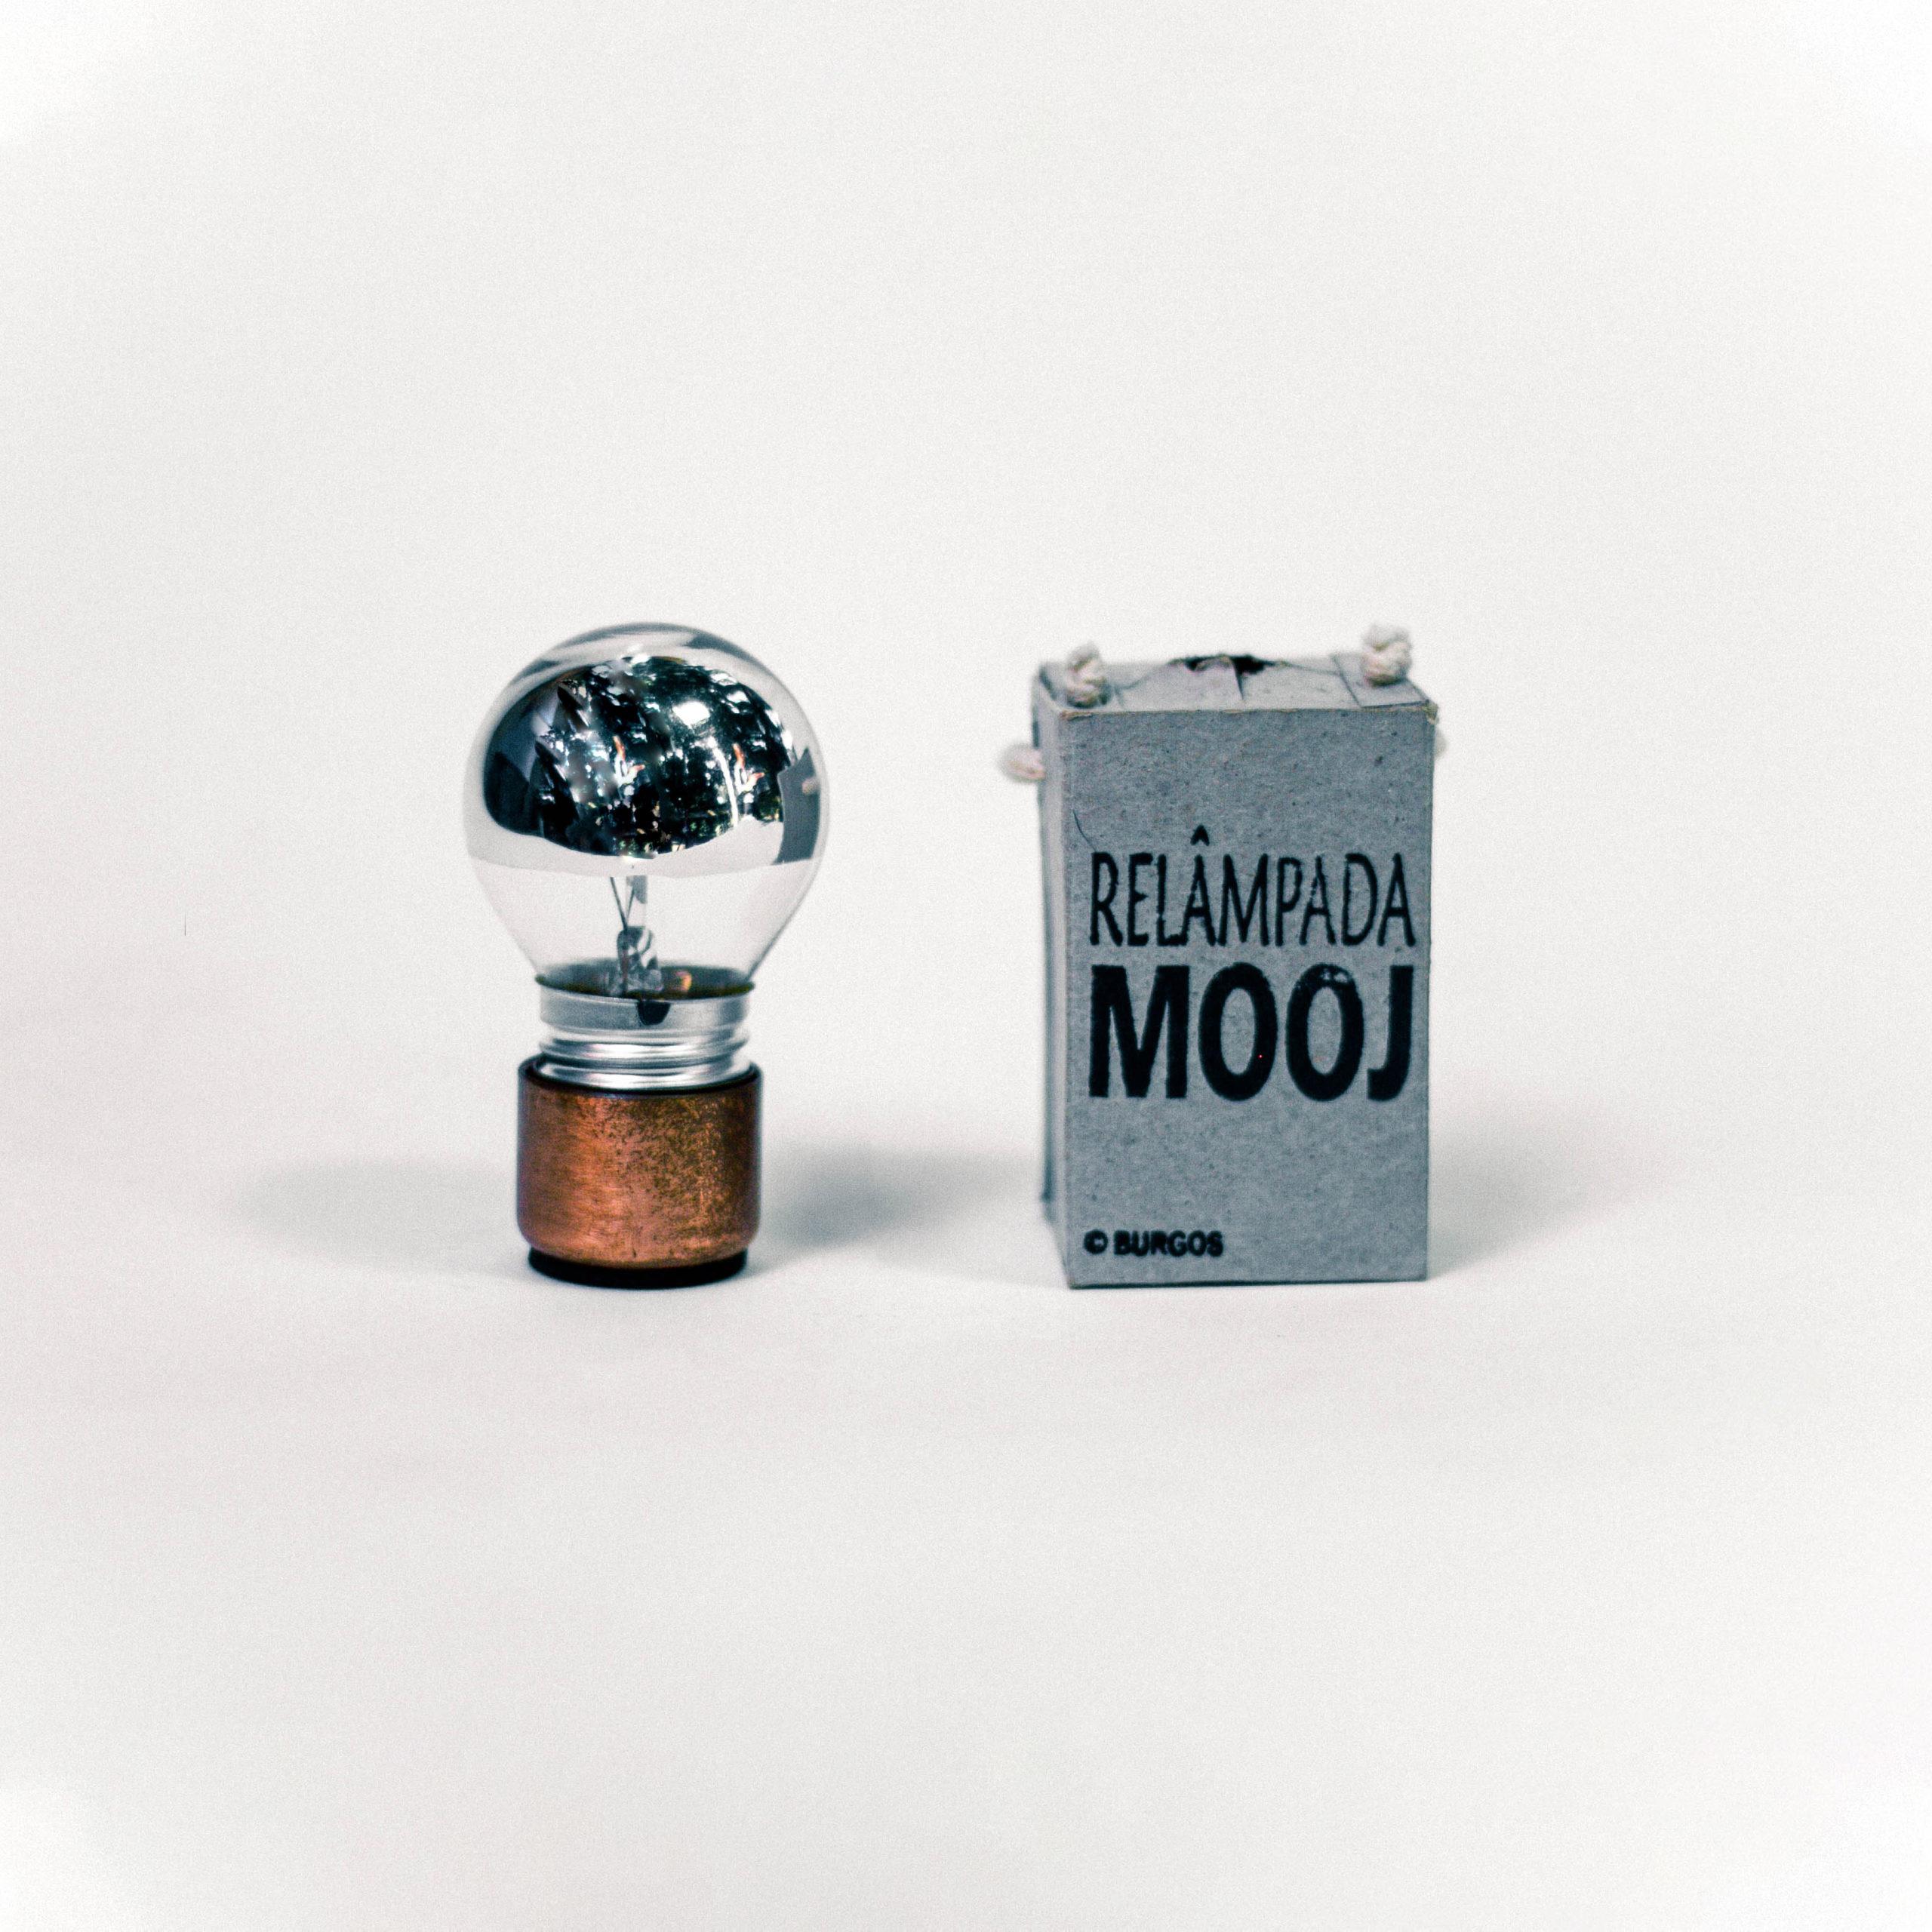 mooj 03 scaled https://www.loja.decorurbano.com.br/product/mooj/